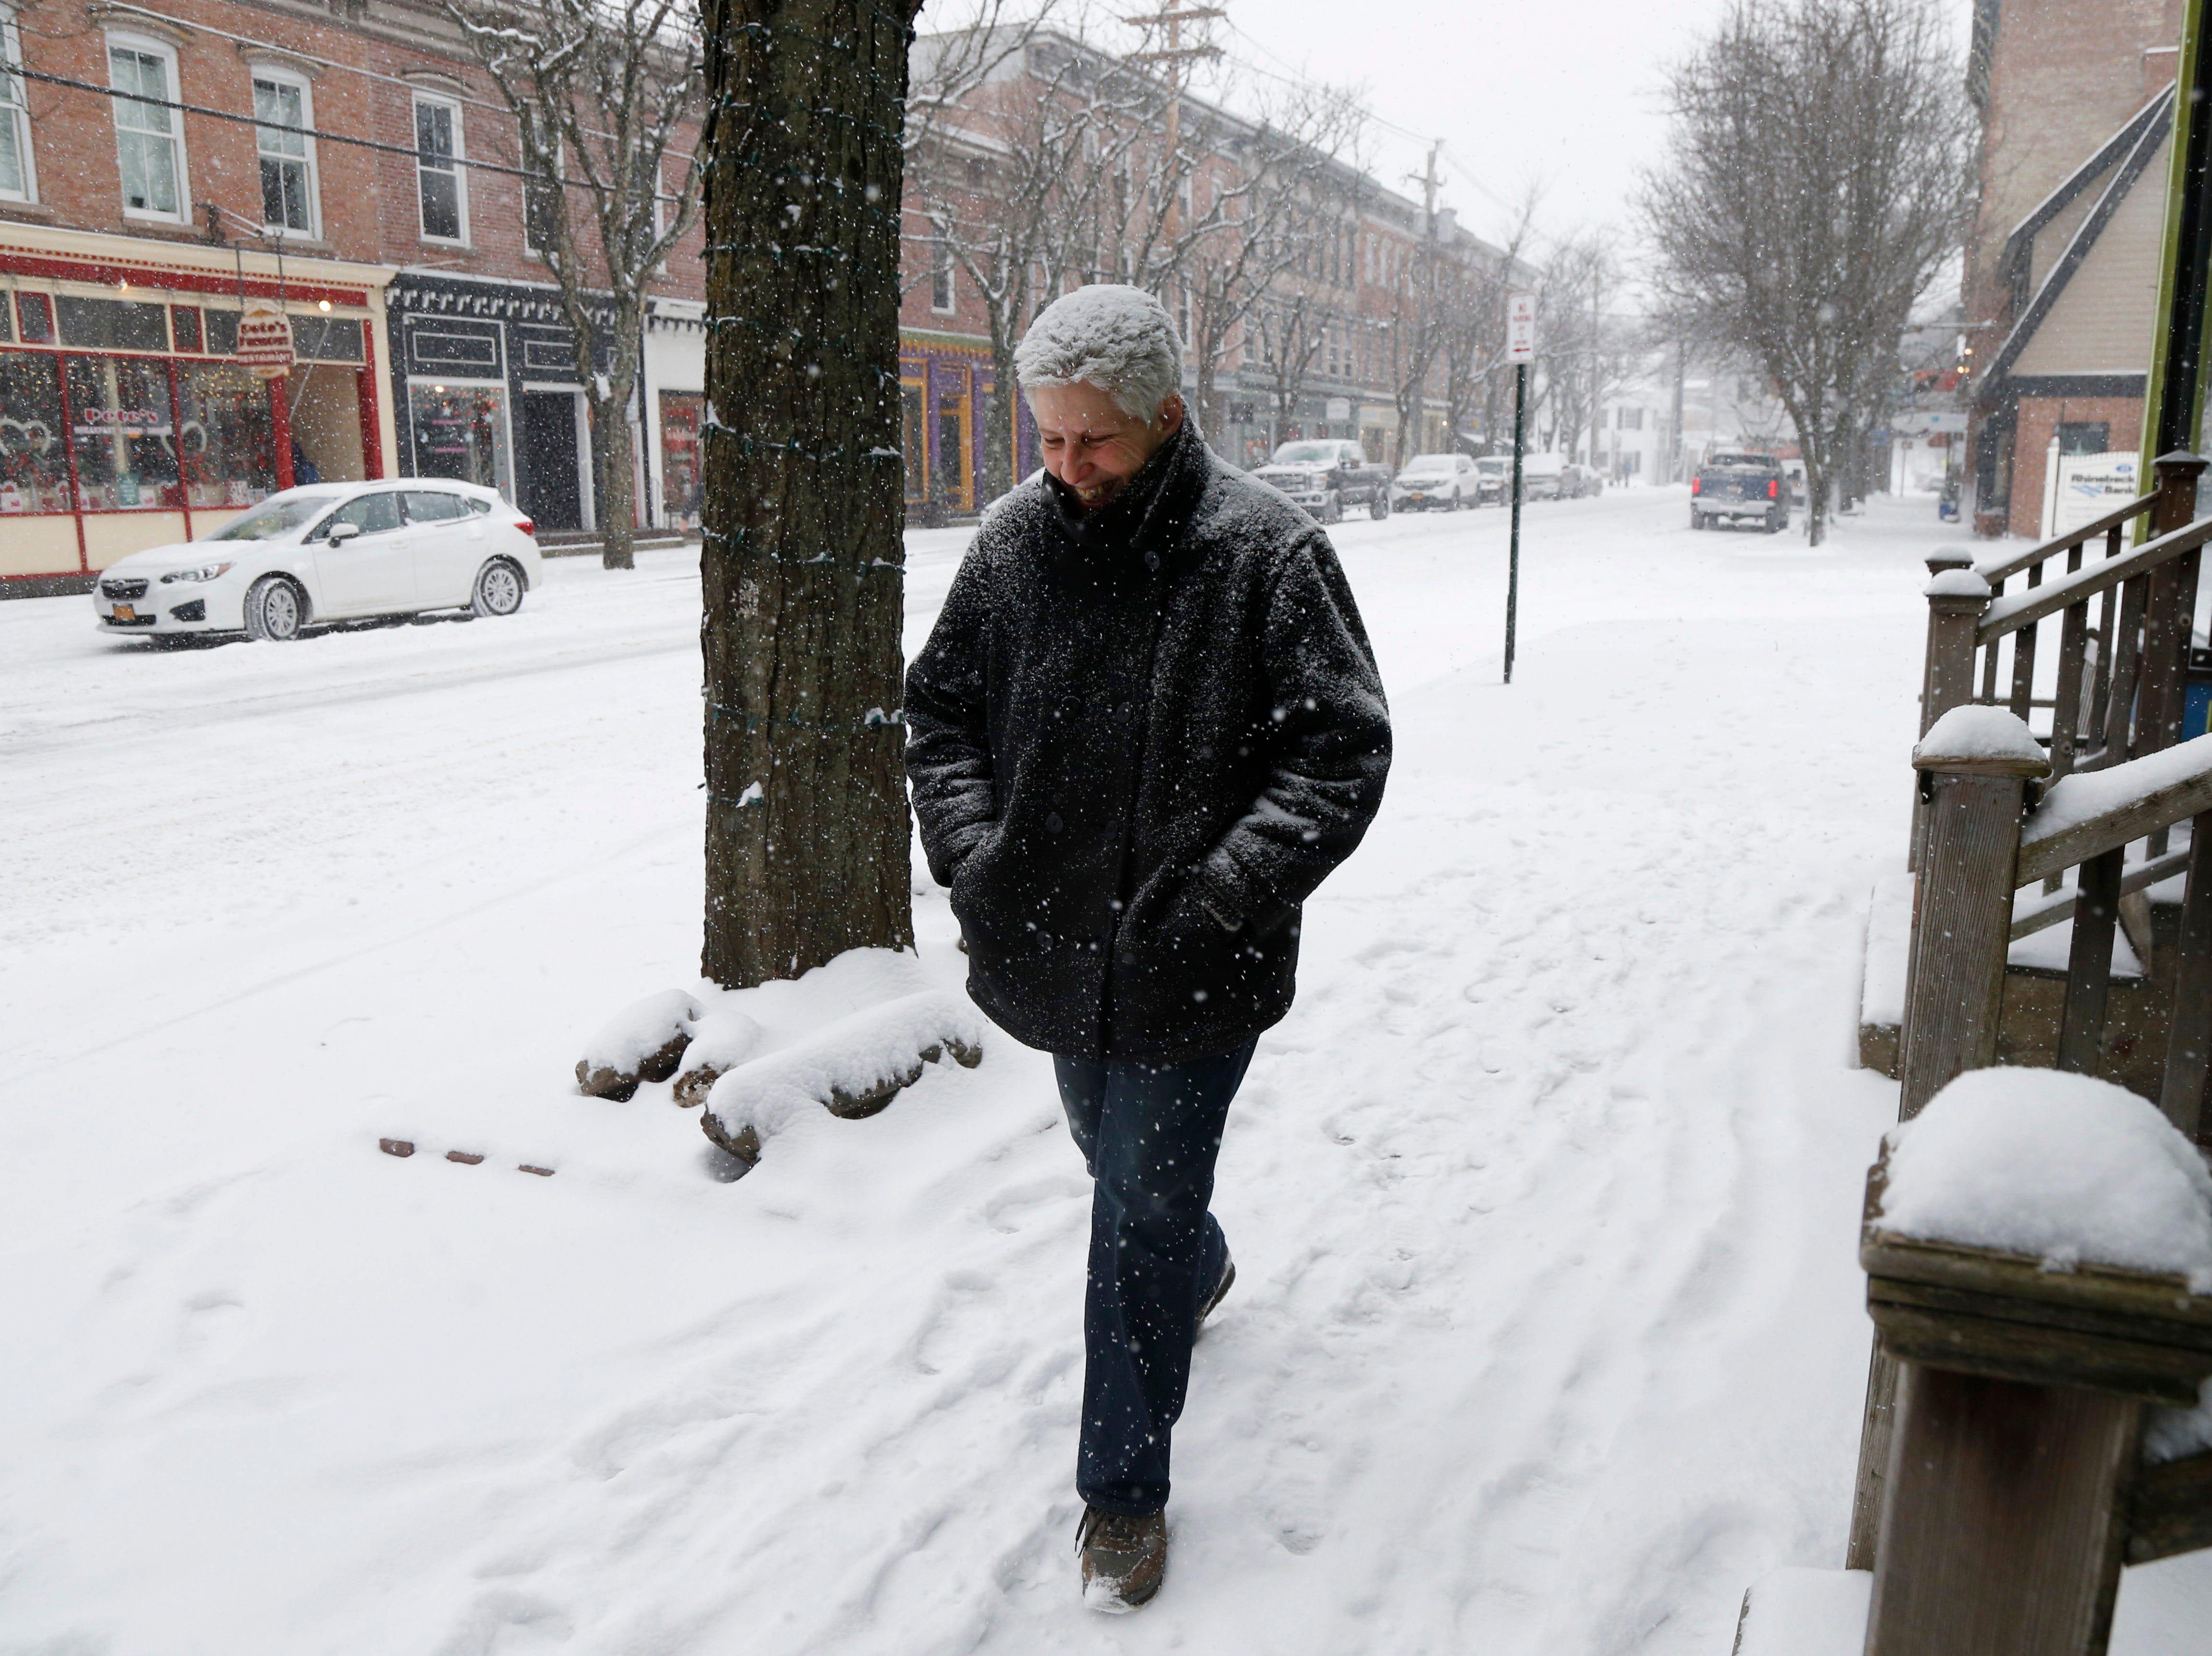 Sally Lyon walks along Market Street in Rhinebeck on February 12, 2019.